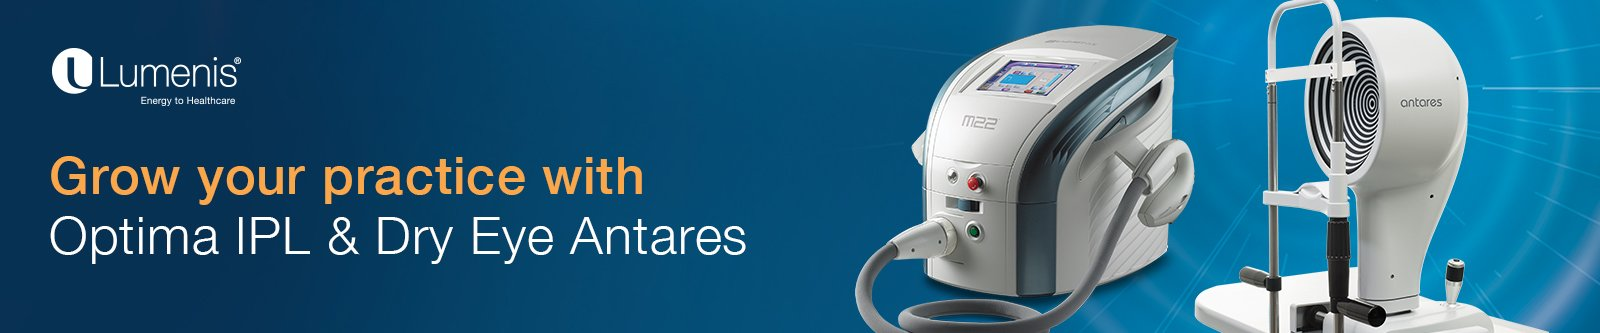 Optima-IPL-&-Dry-Eye-Antares-Kit-1600x333